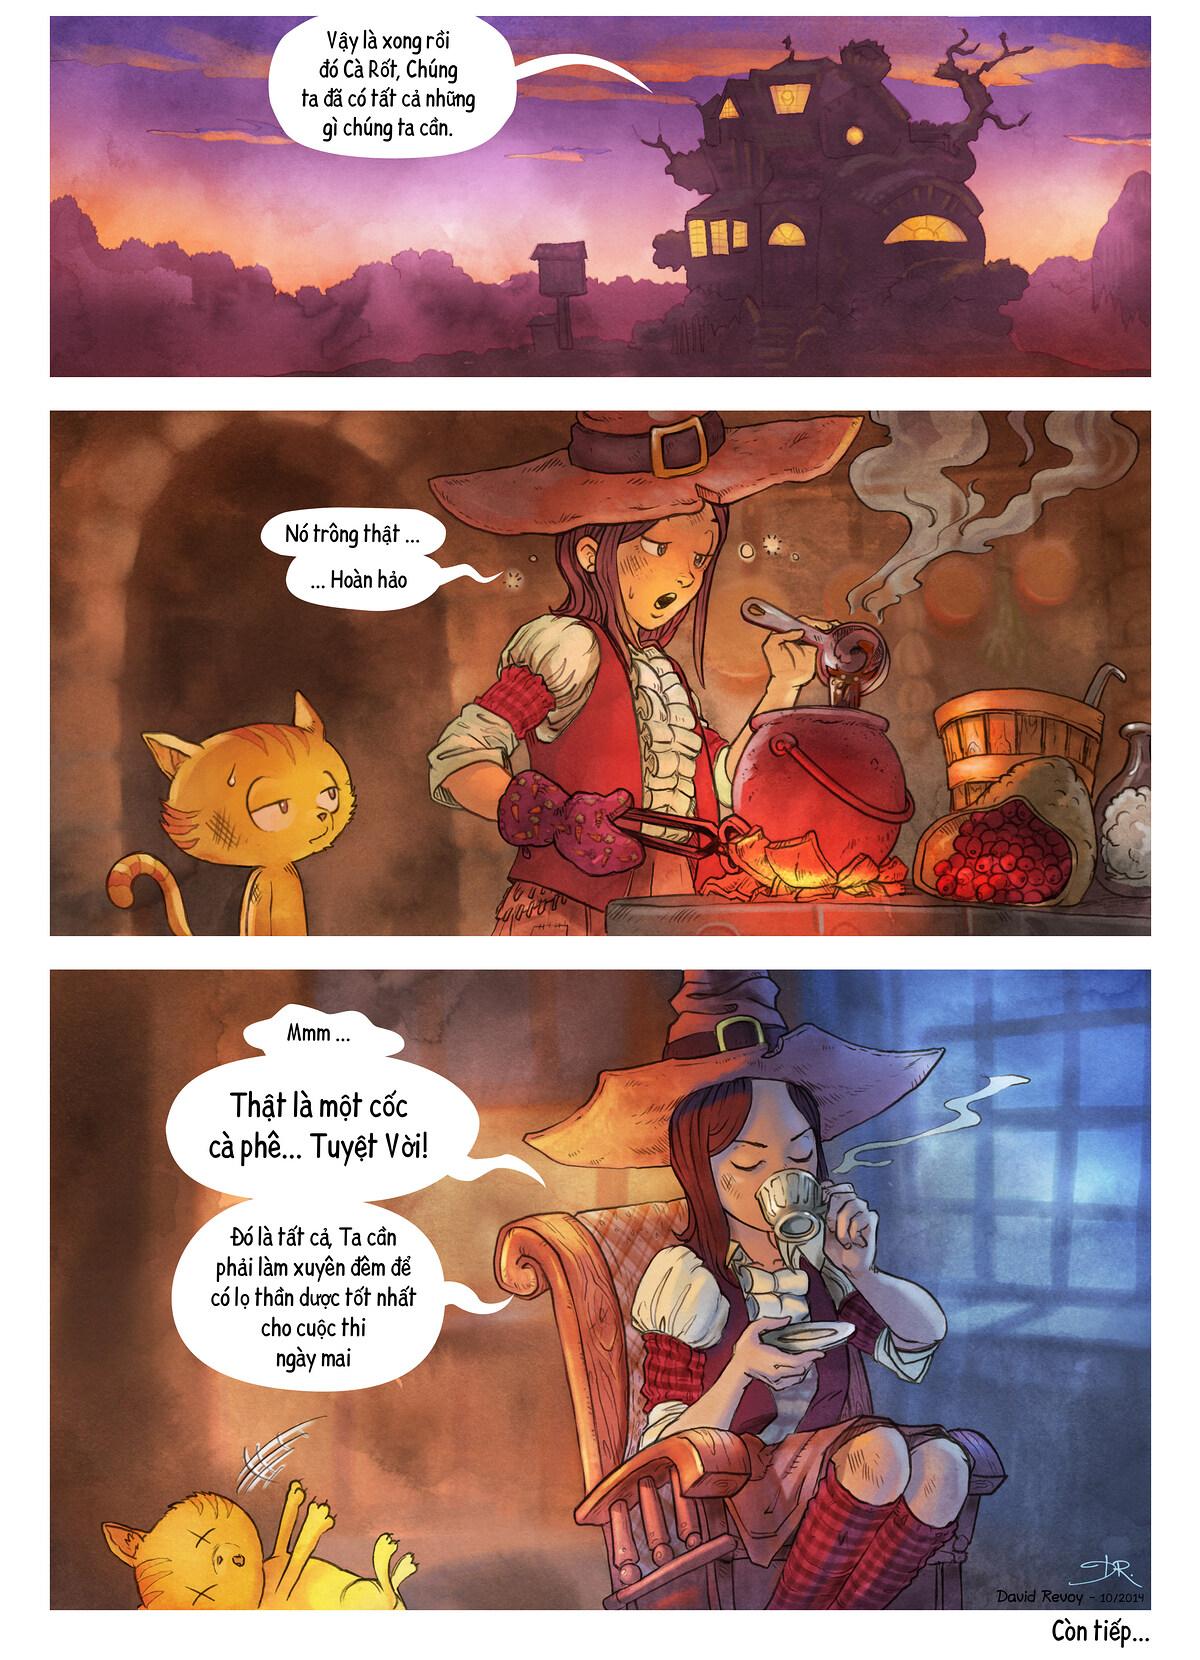 A webcomic page of Pepper&Carrot, Tập 3 [vi], trang 7